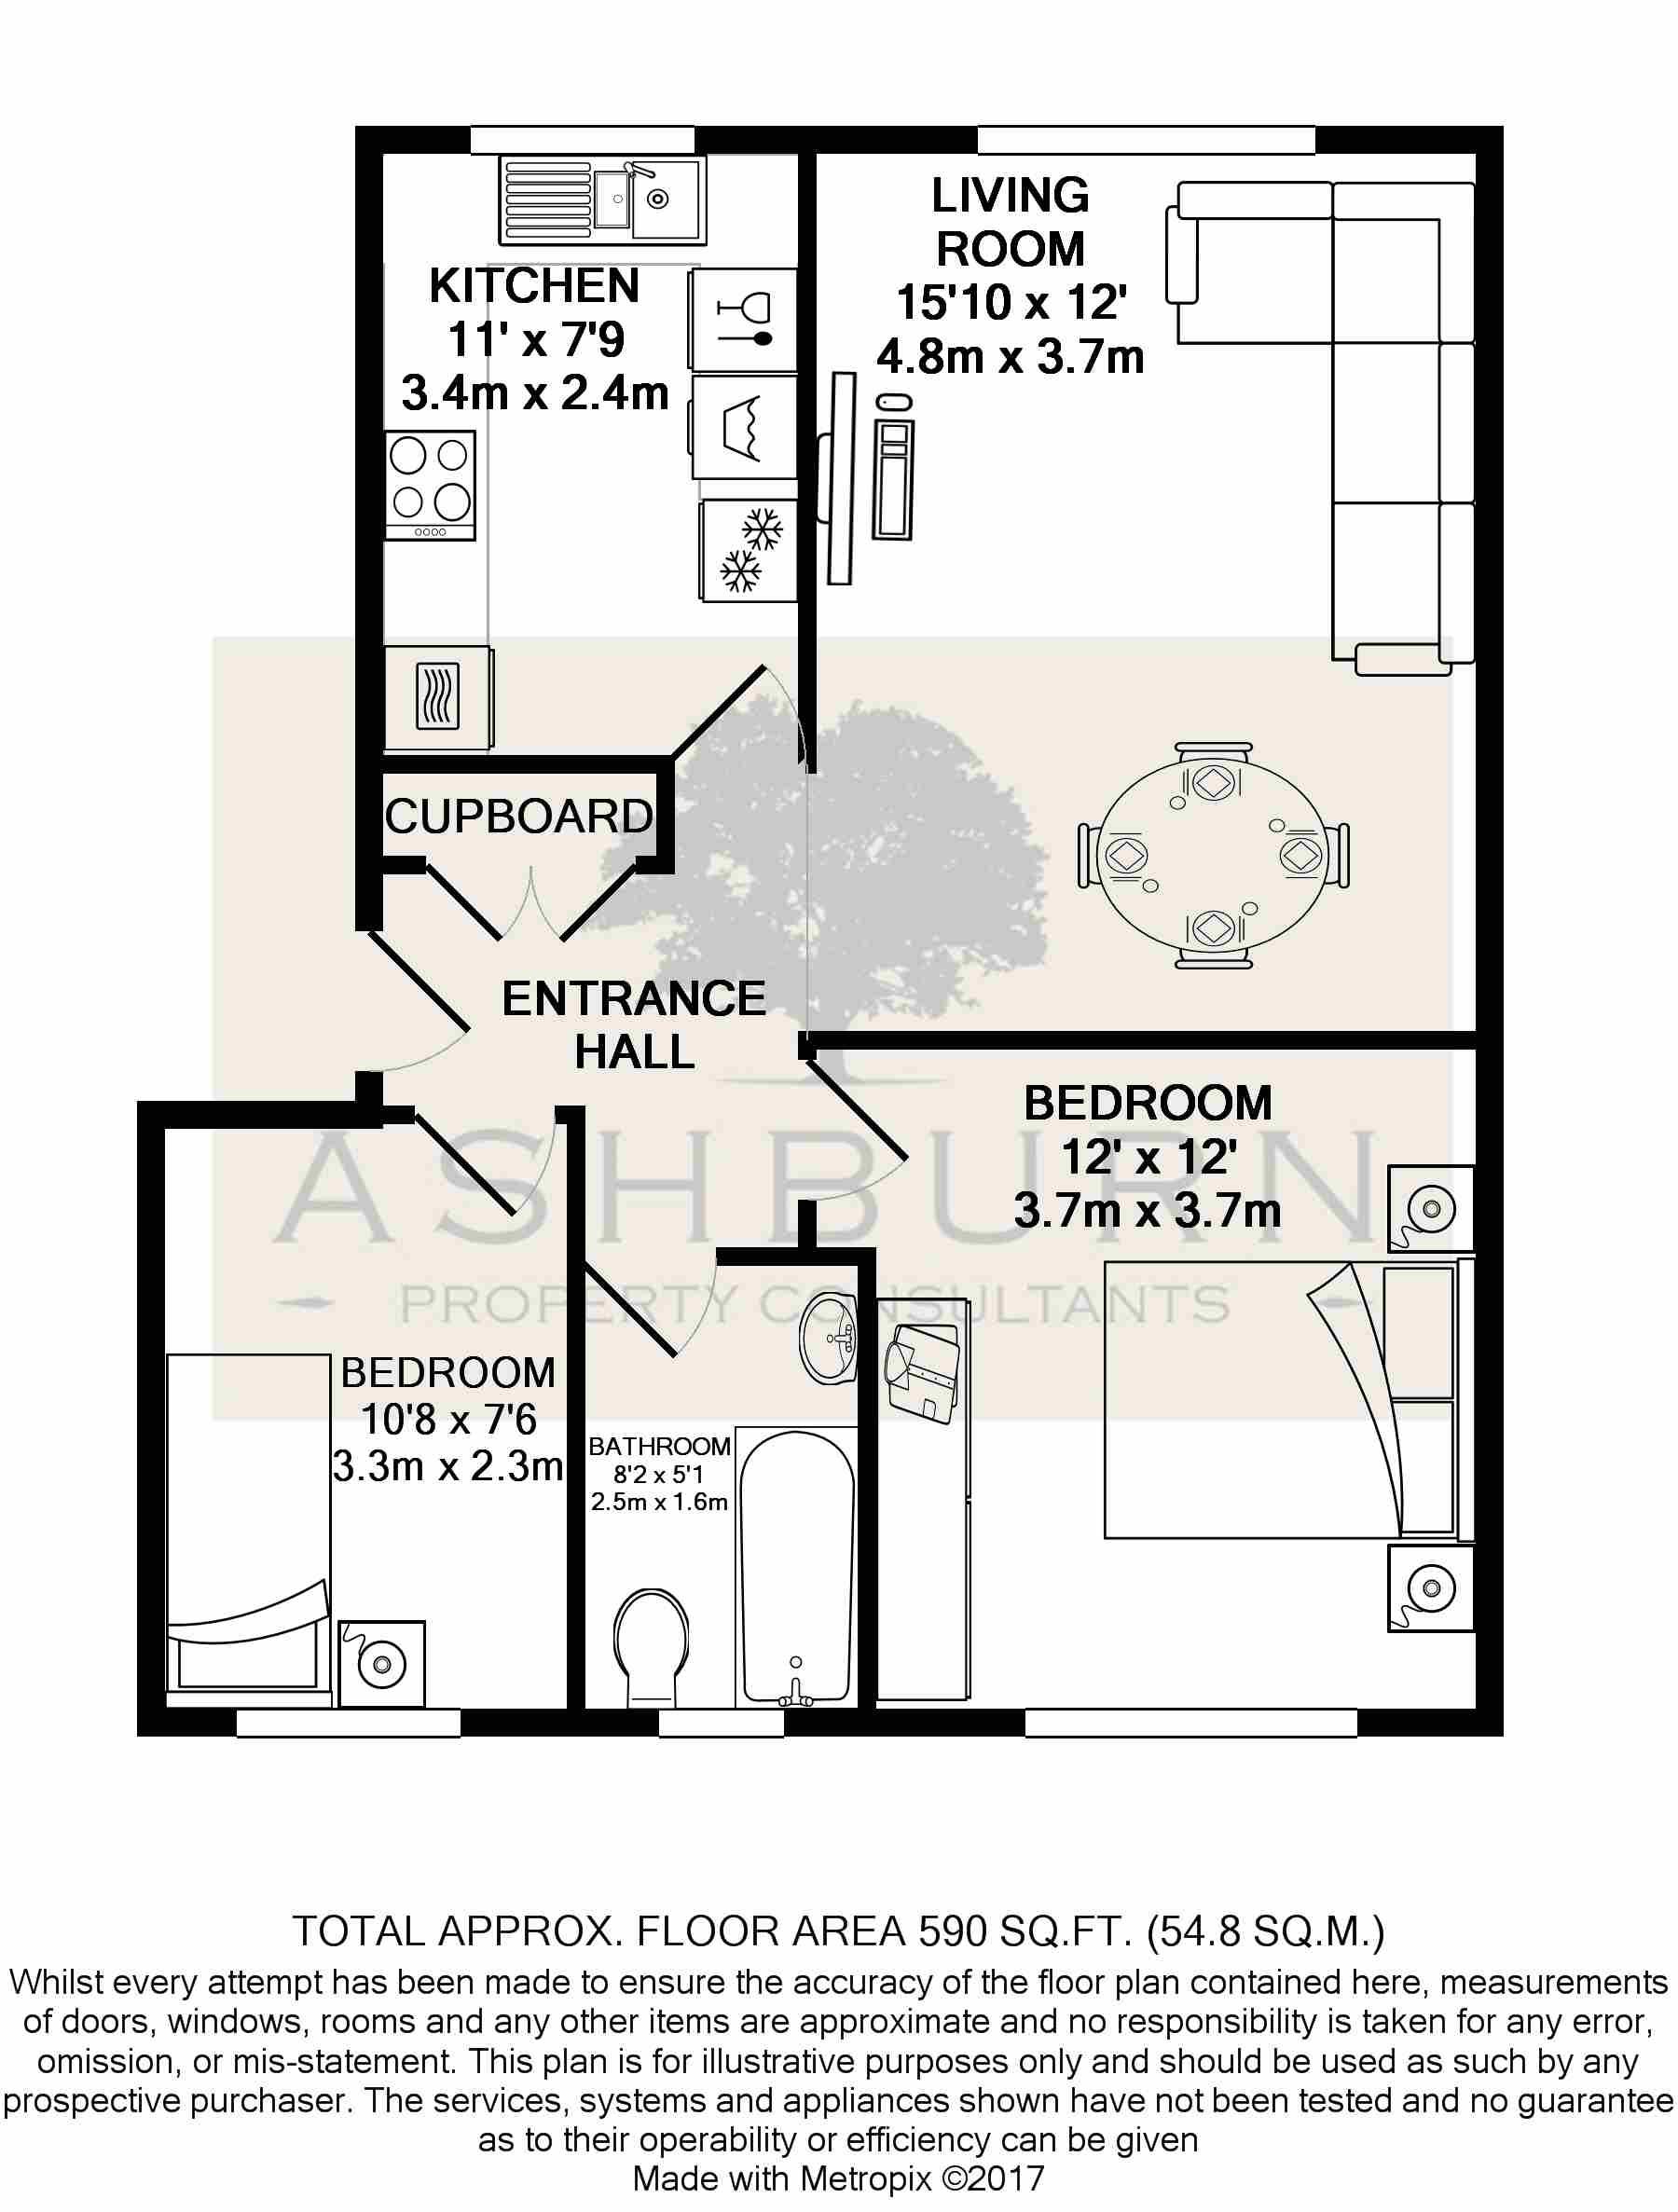 Ashburn Property Services Luton